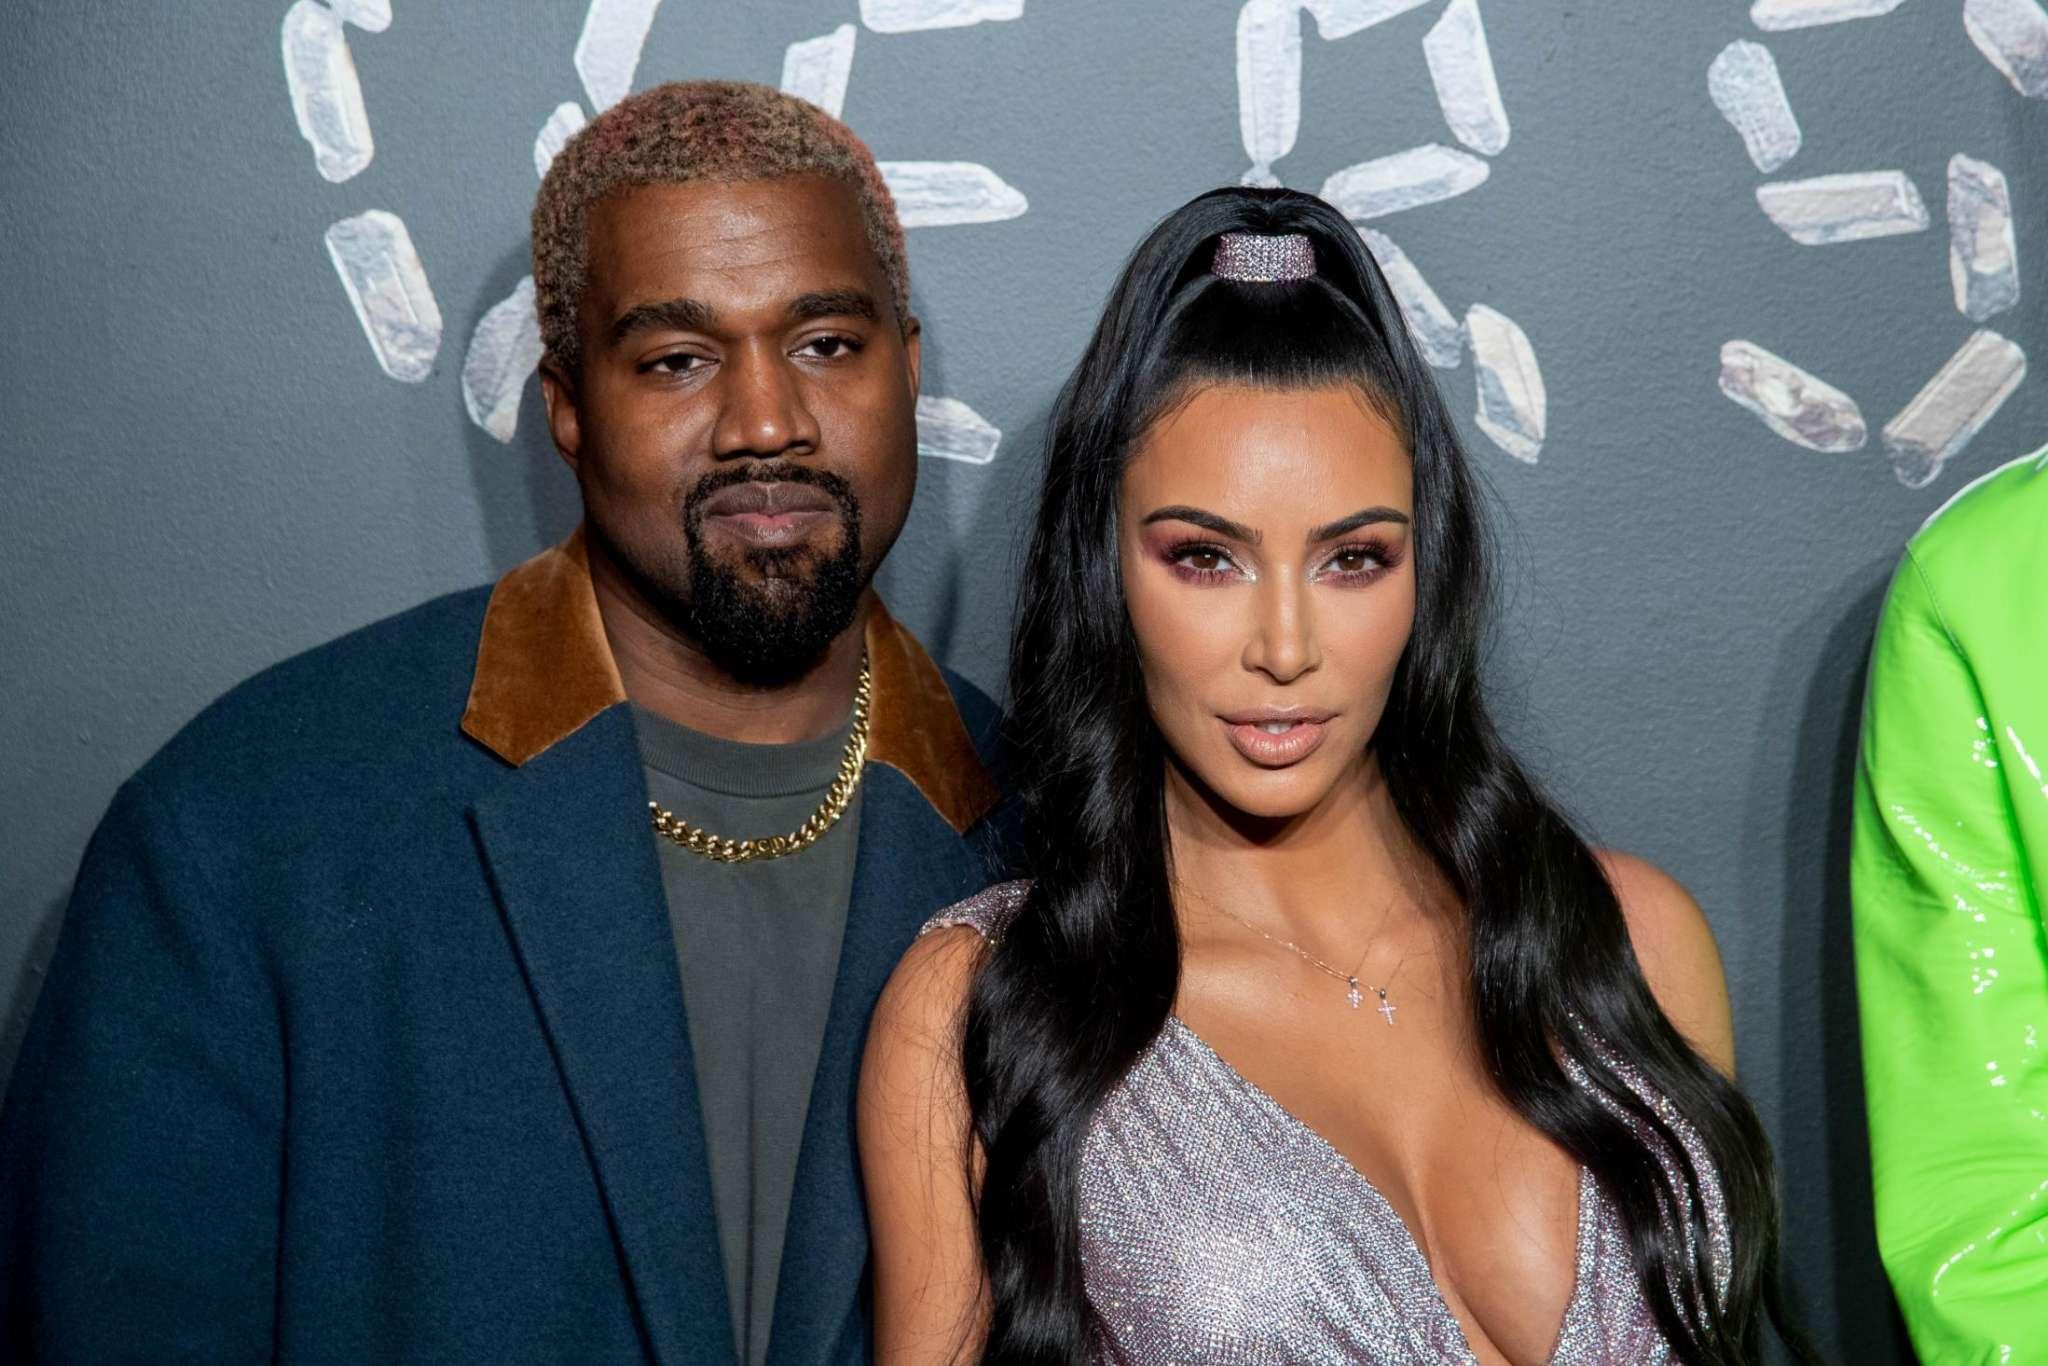 kim-kardashians-fans-blast-her-for-the-latest-photo-she-shared